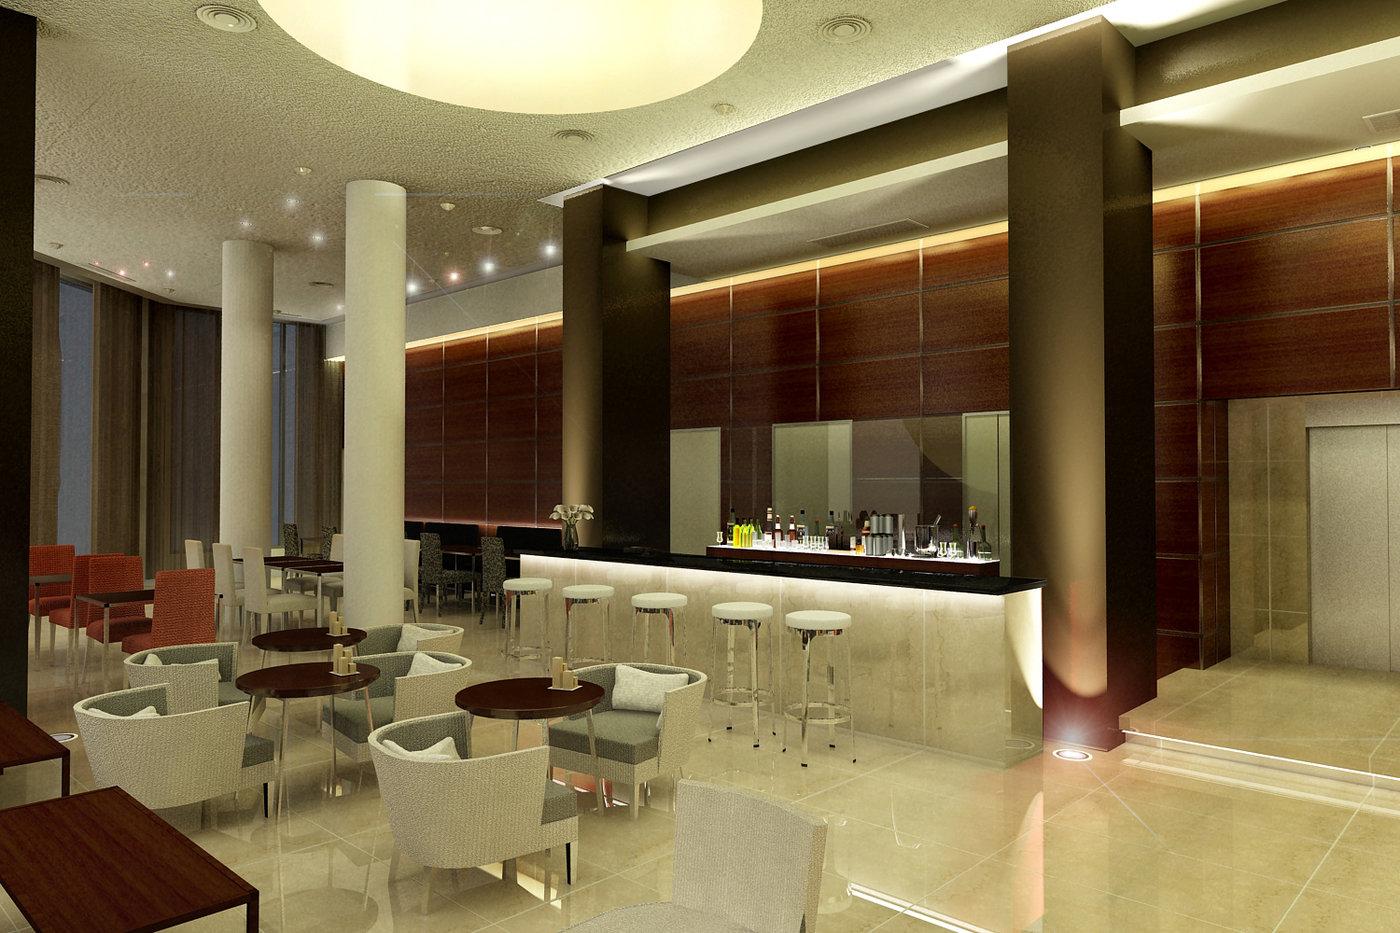 Interior Design Professional Level By Nicolas Kedzierski At